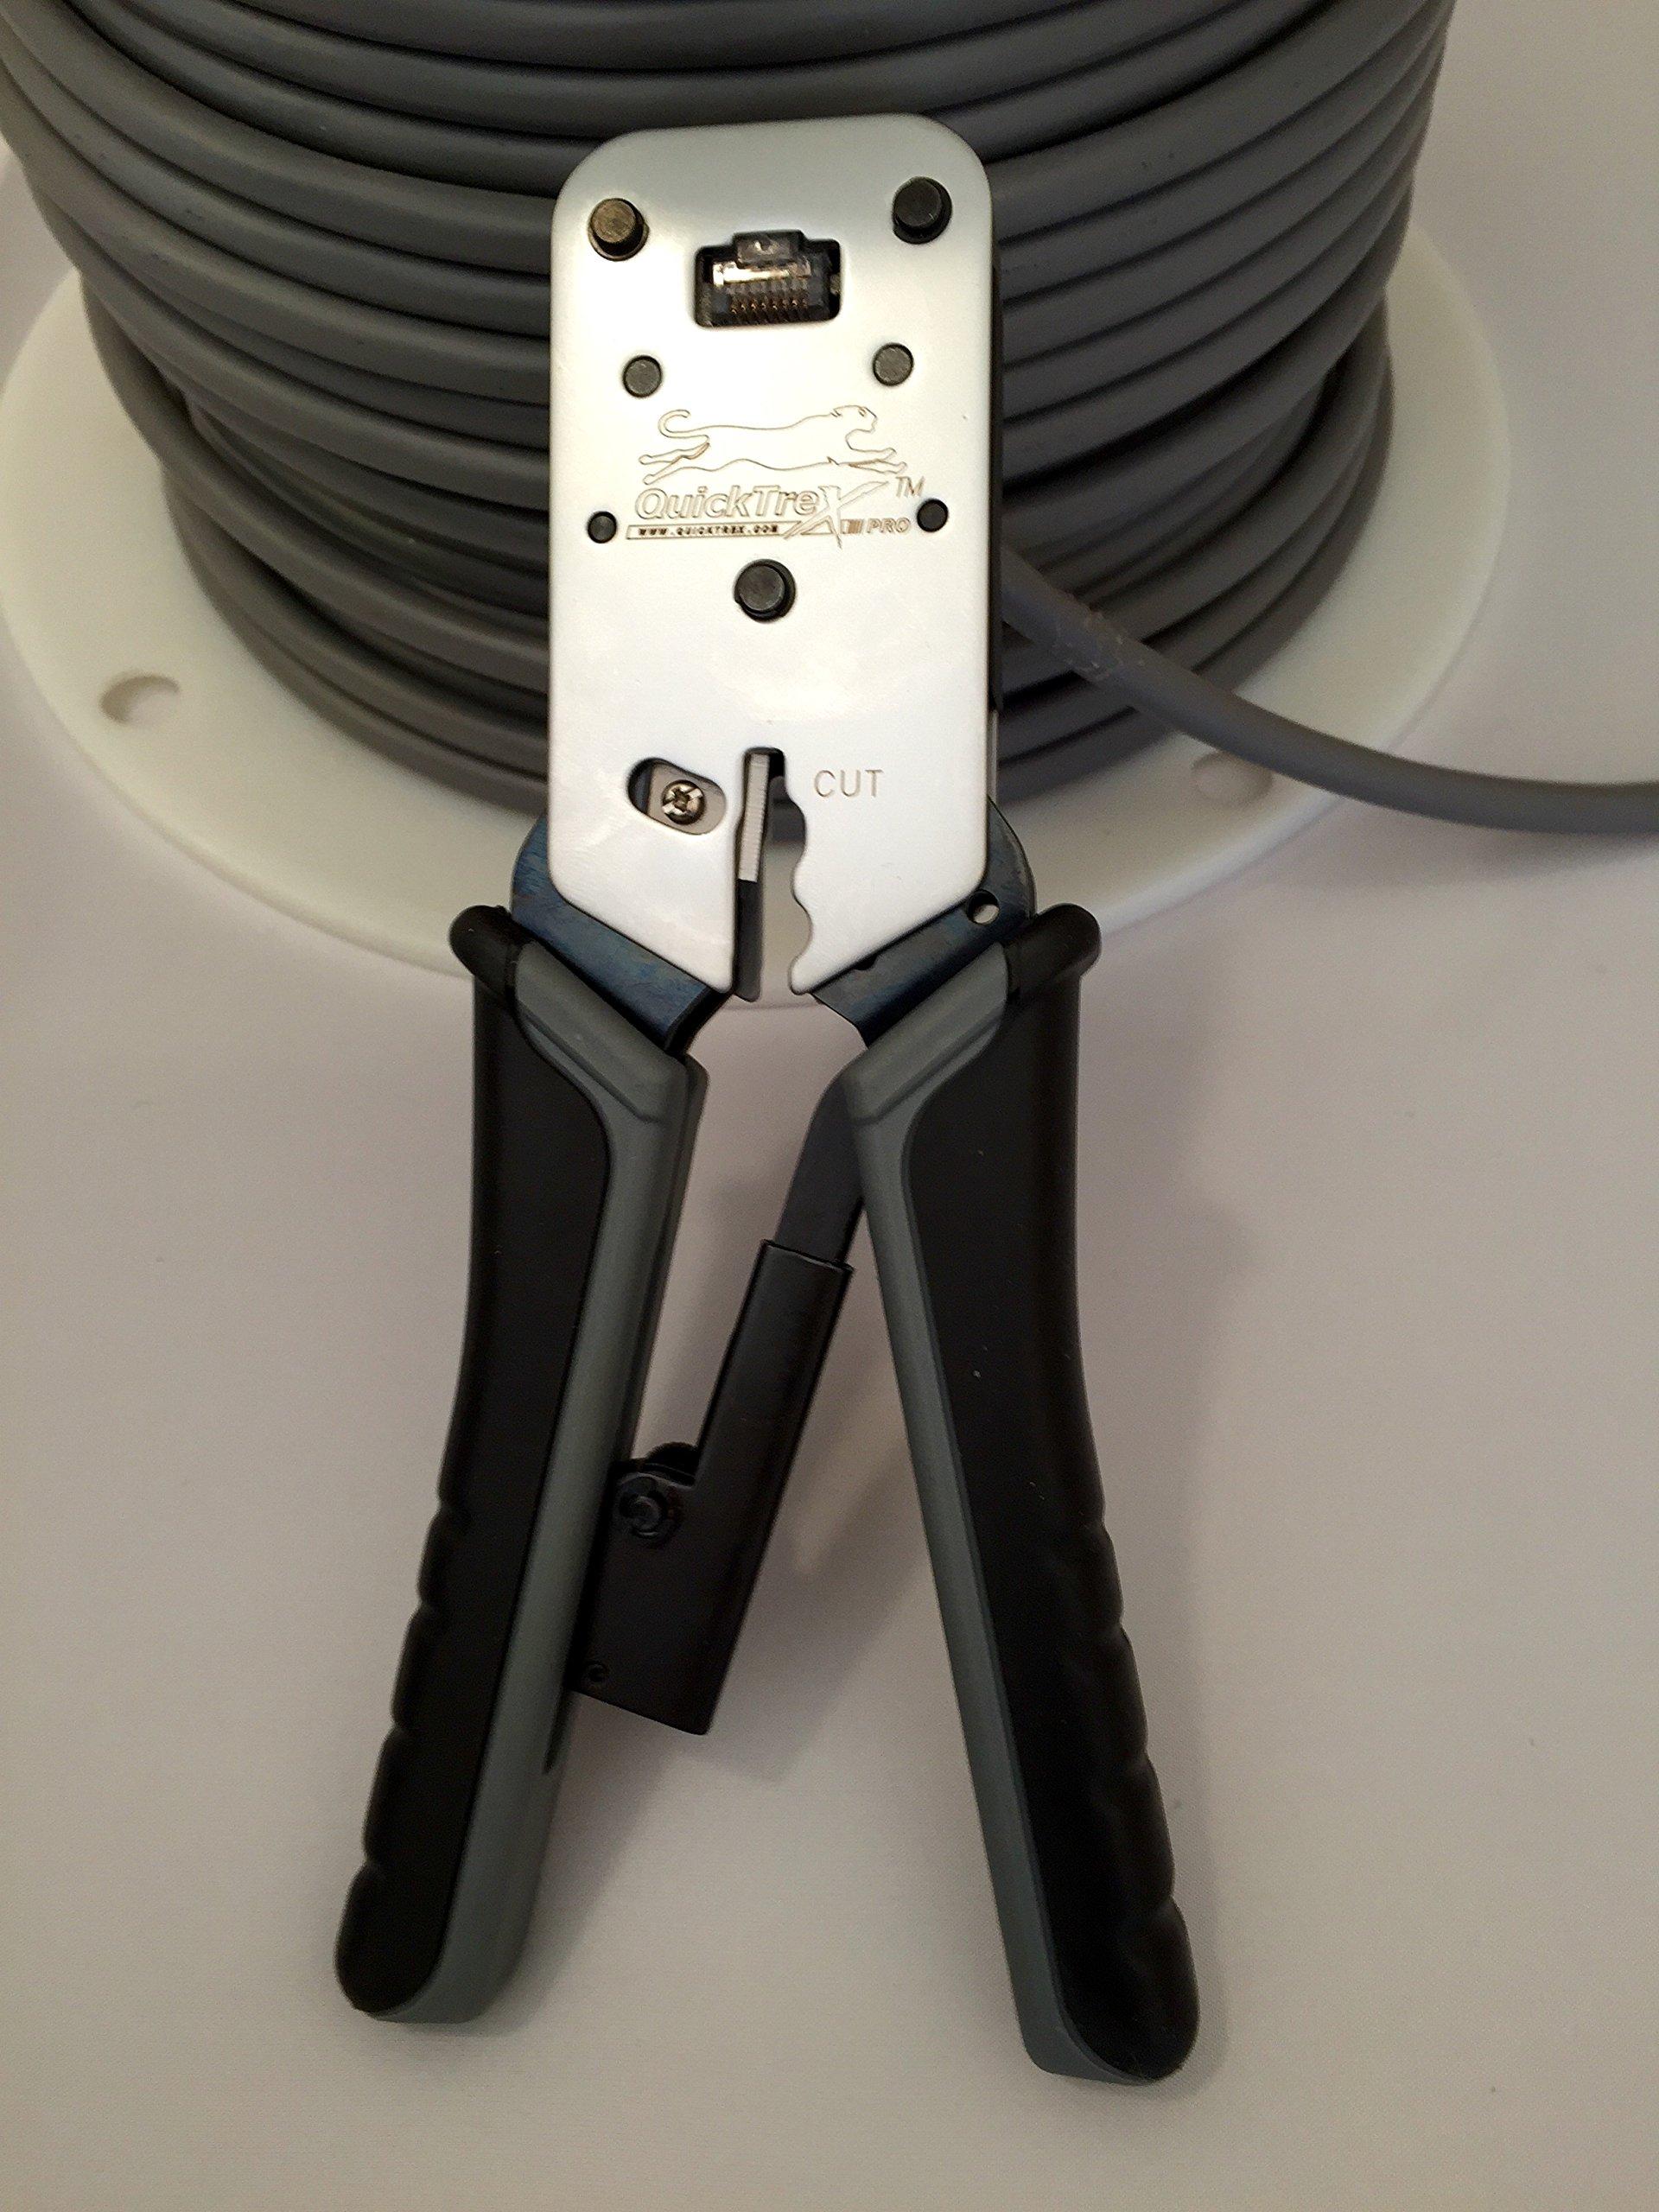 RJ-45 Crimping Tool - ''QuickTreX® Professional ''Wire Surgeon®'' RJ-45 Crimper'' by QuickTreX